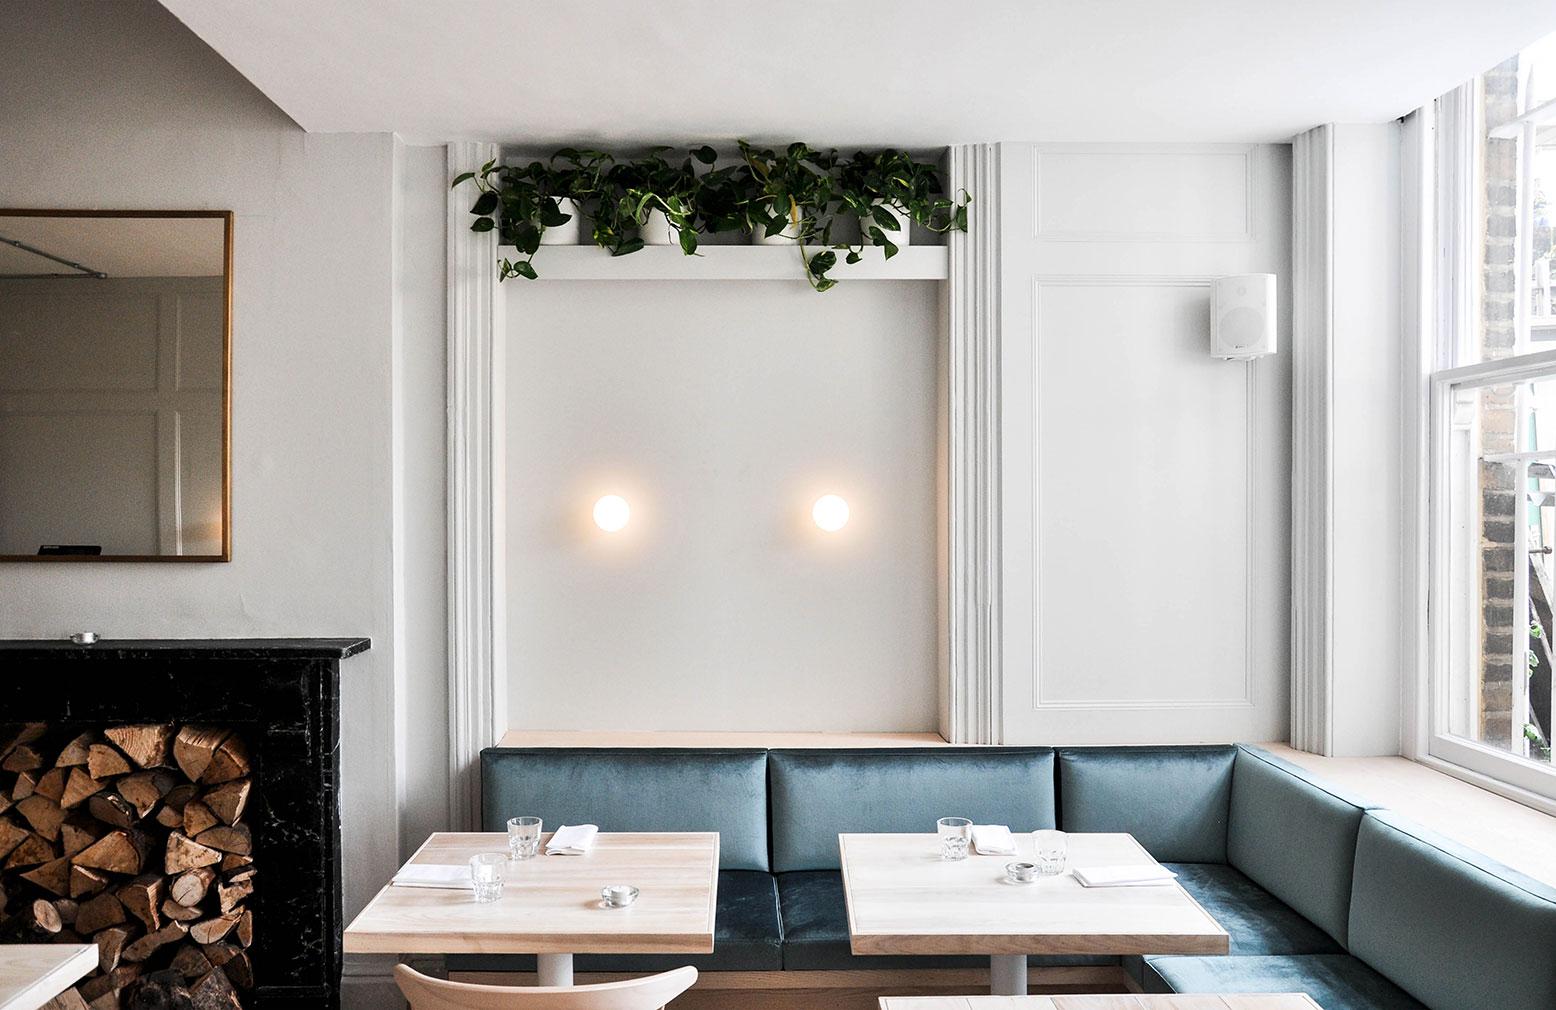 Coal Rooms restaurant in Peckham Rye